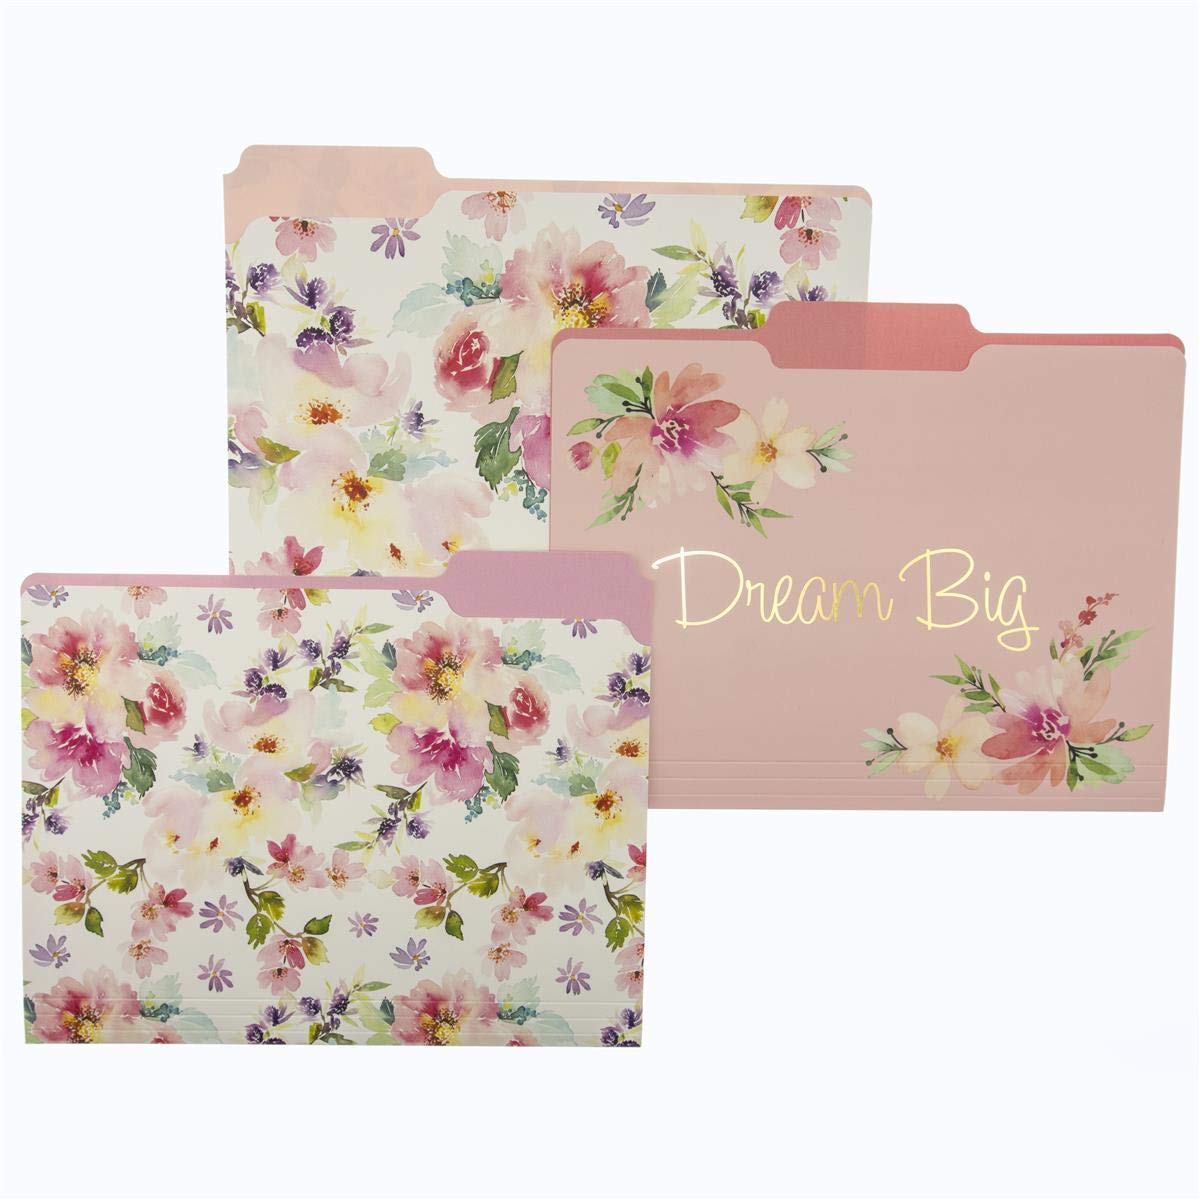 "Graphique Watercolor Floral File Folder Set – File Set Includes 9 Folders and 3 Unique Floral Designs, Embellished w/ Gold Foil  on Durable Triple-Scored Coated Cardstock, 11.75"" x 9.5"""